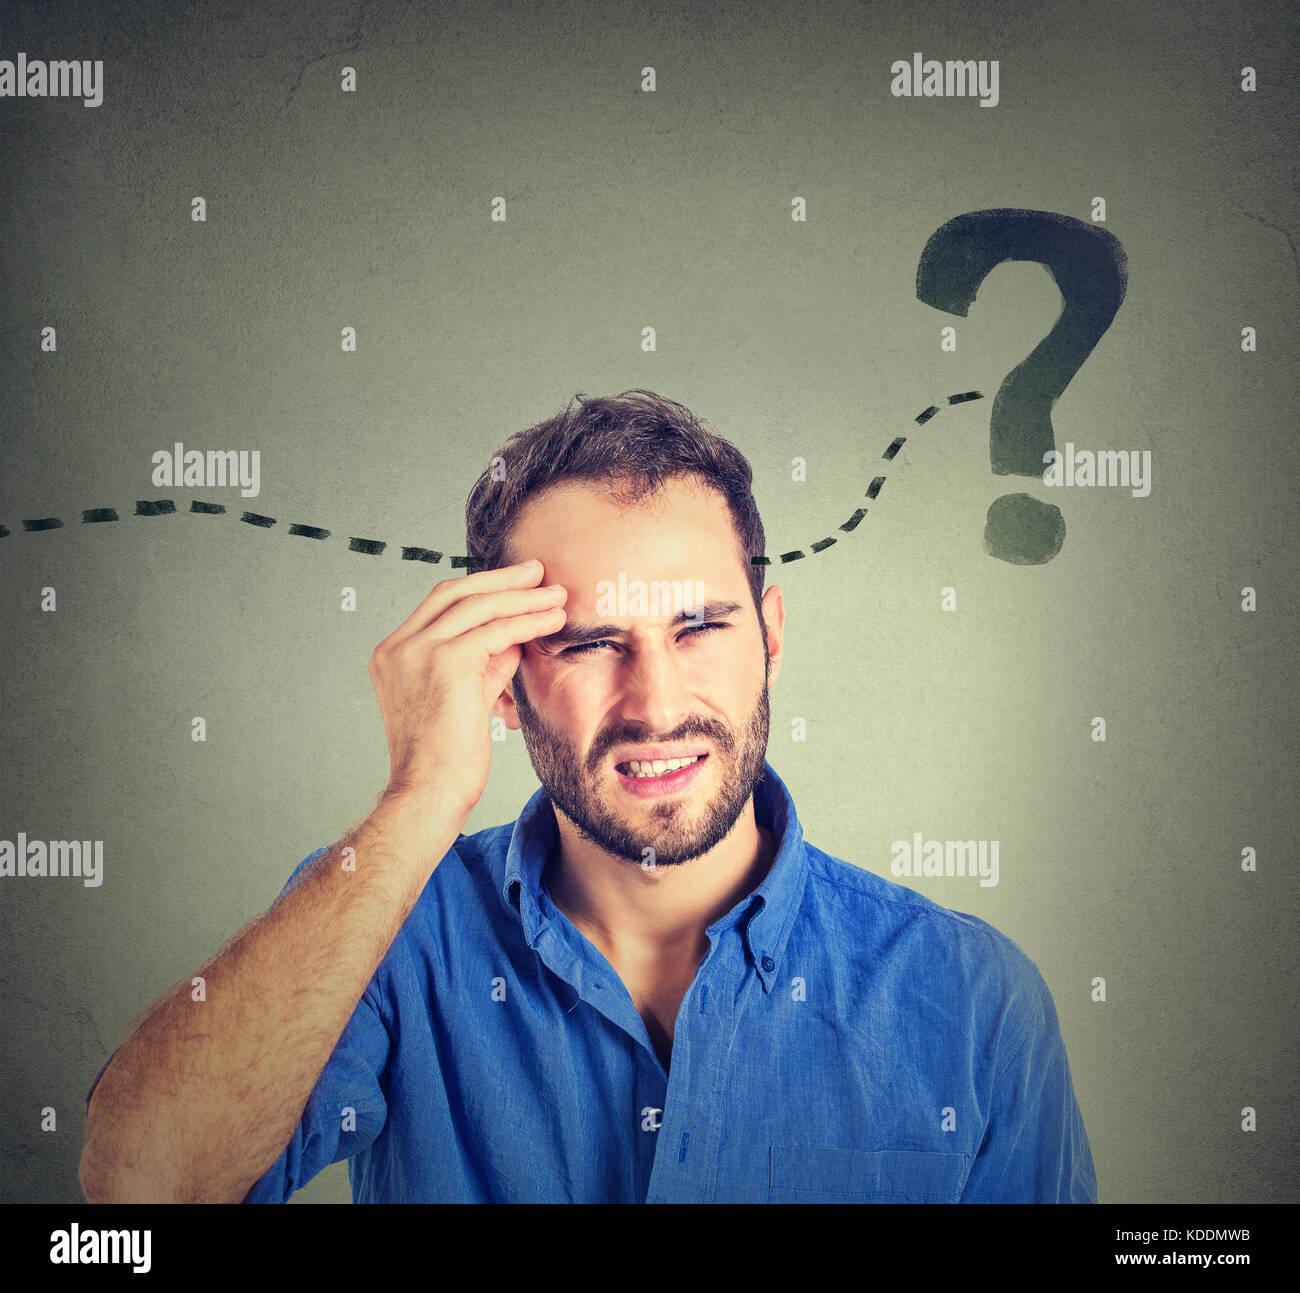 Hombre pensando buscando una solución. Imagen De Stock